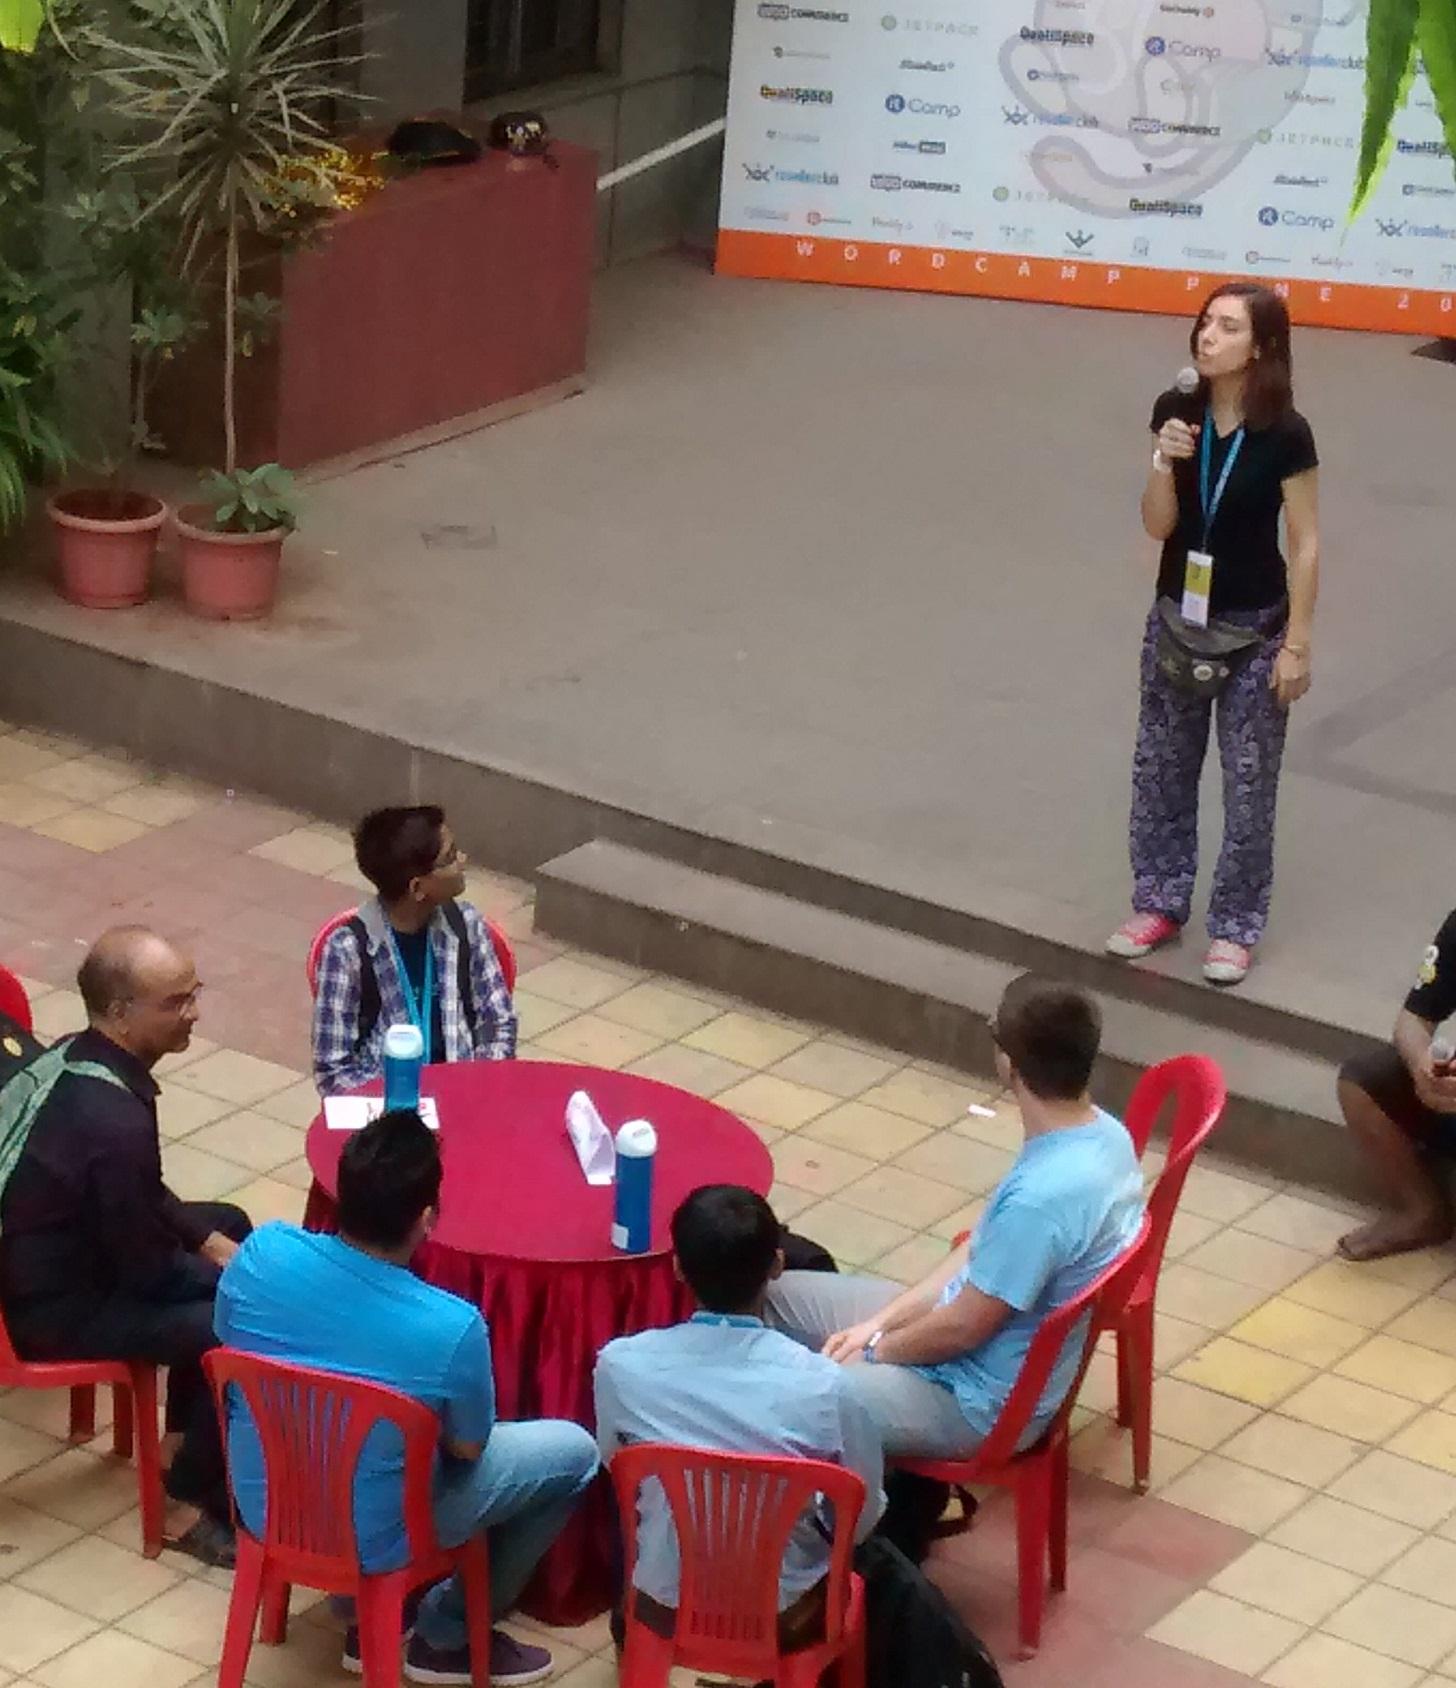 The speaker's circle at WordCamp Pune